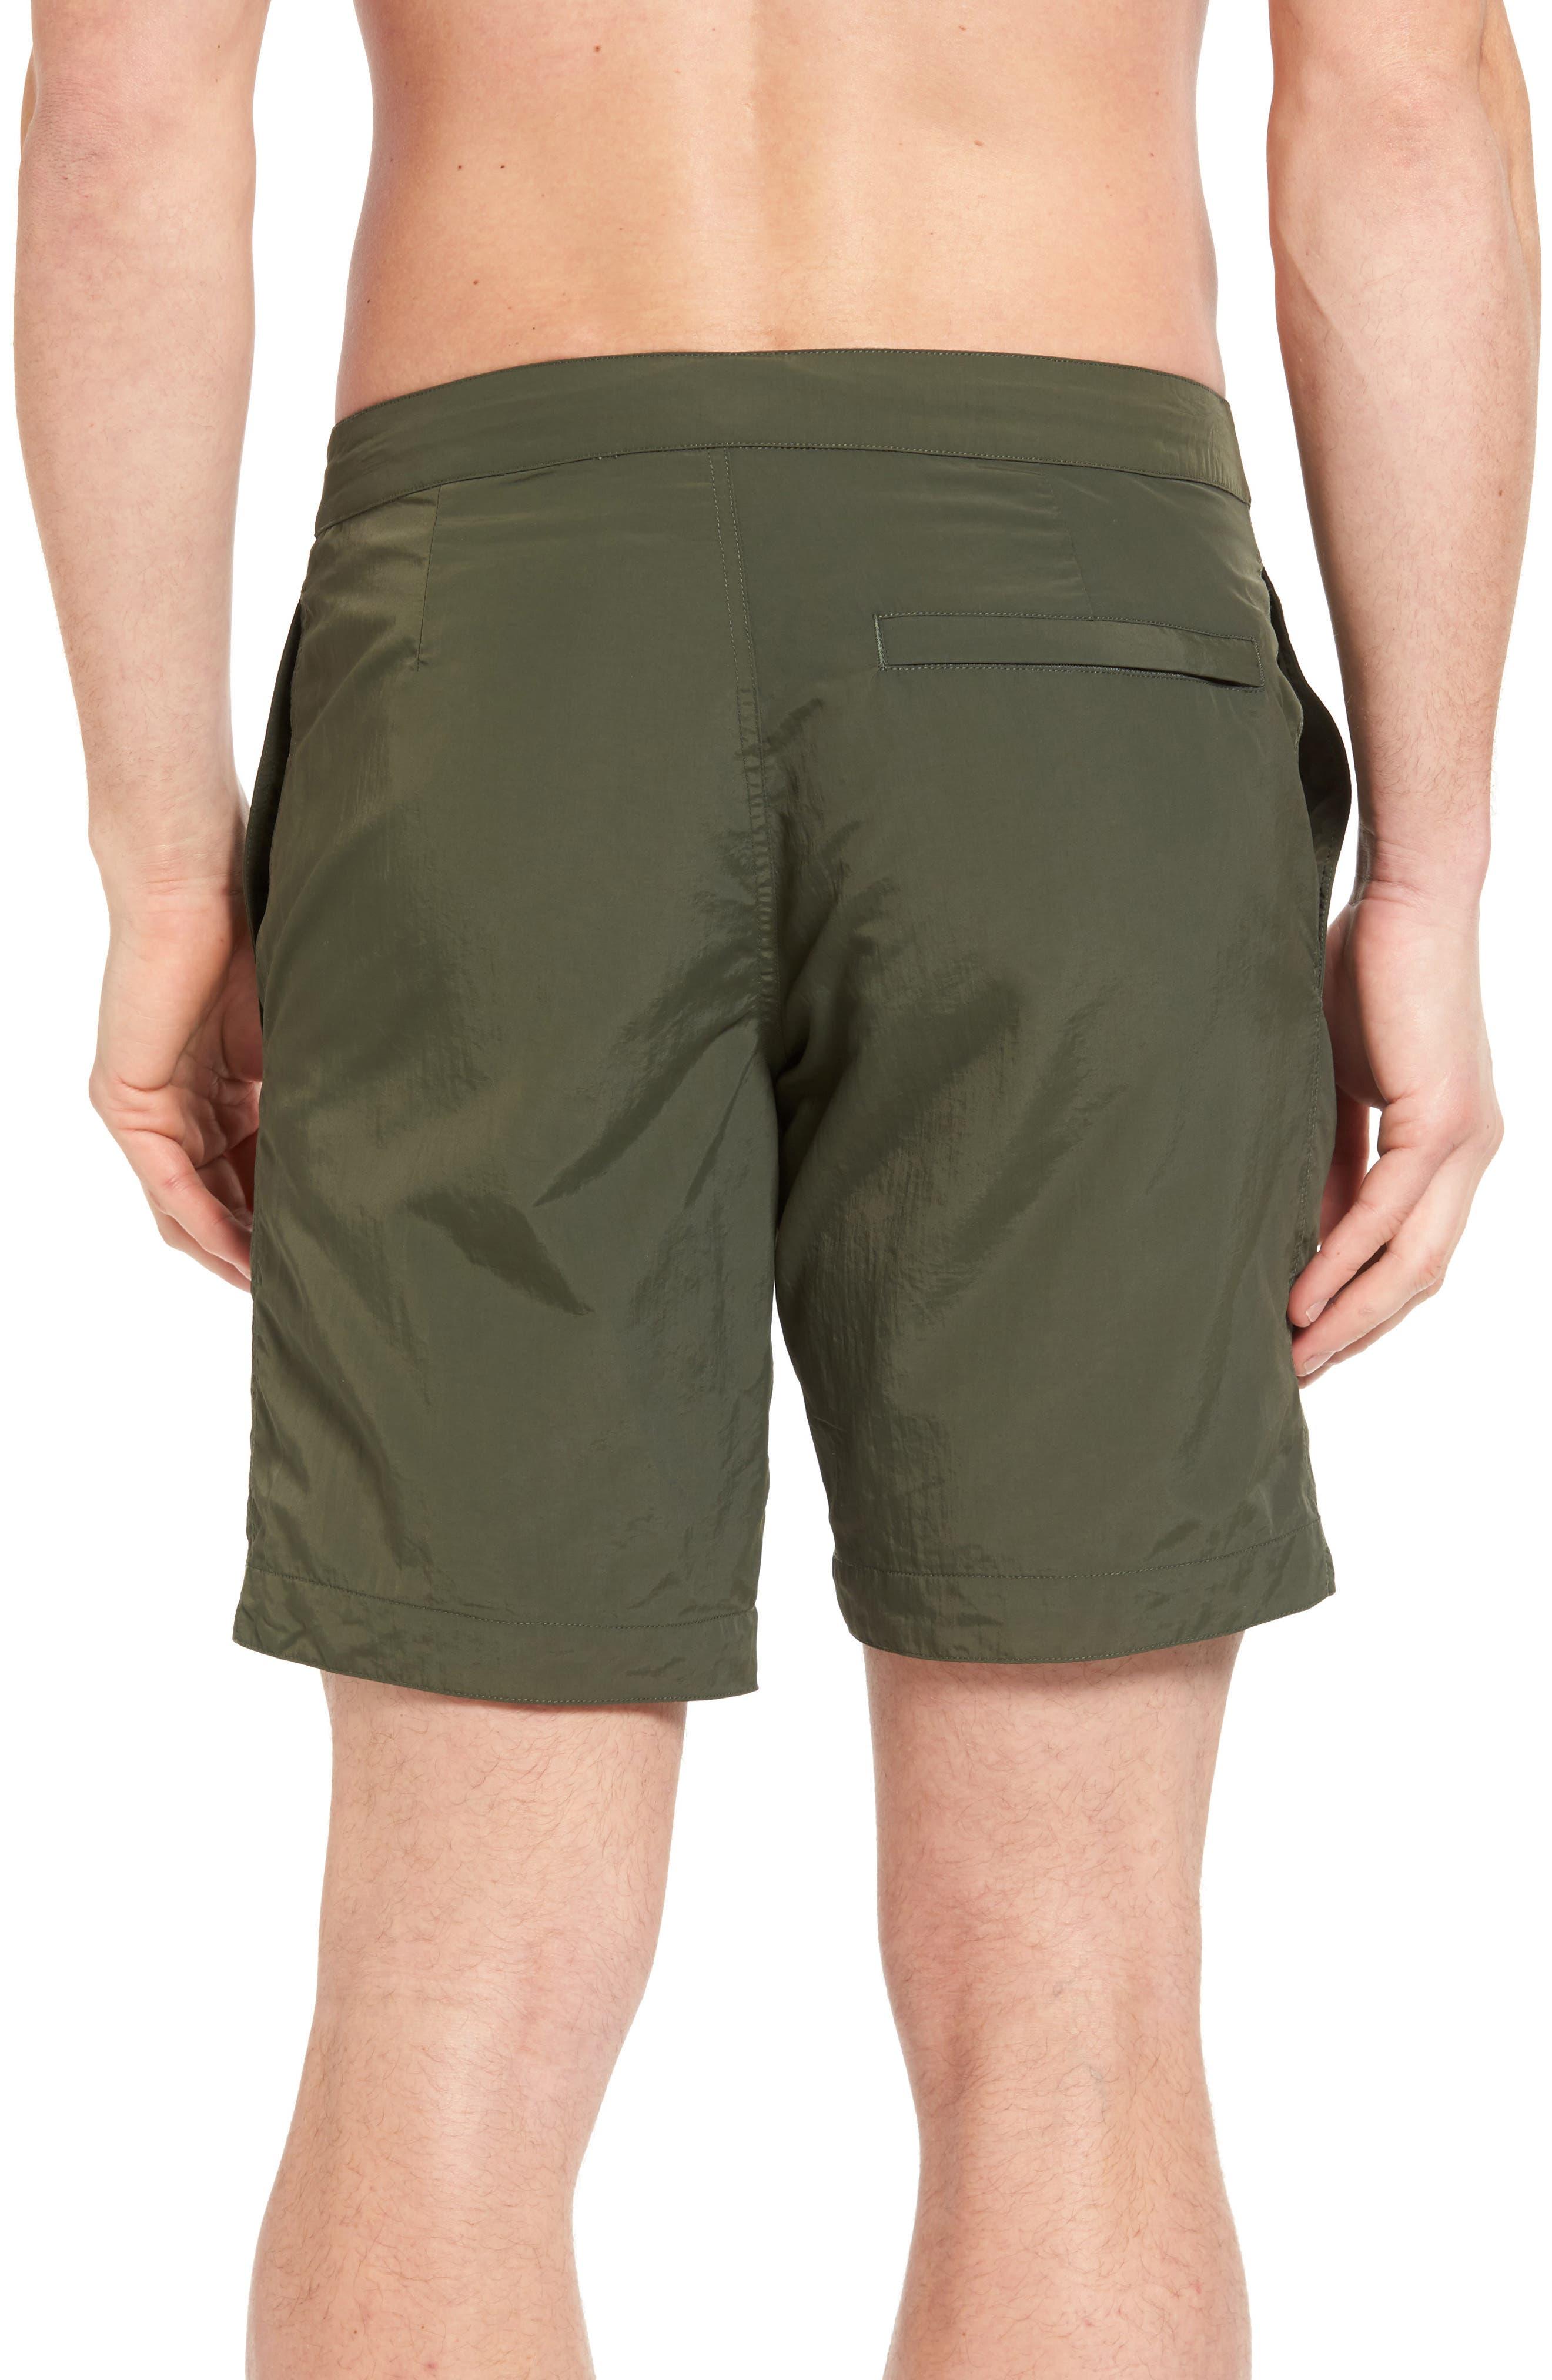 'Aruba - Island' Tailored Fit 8.5 Inch Board Shorts,                             Alternate thumbnail 7, color,